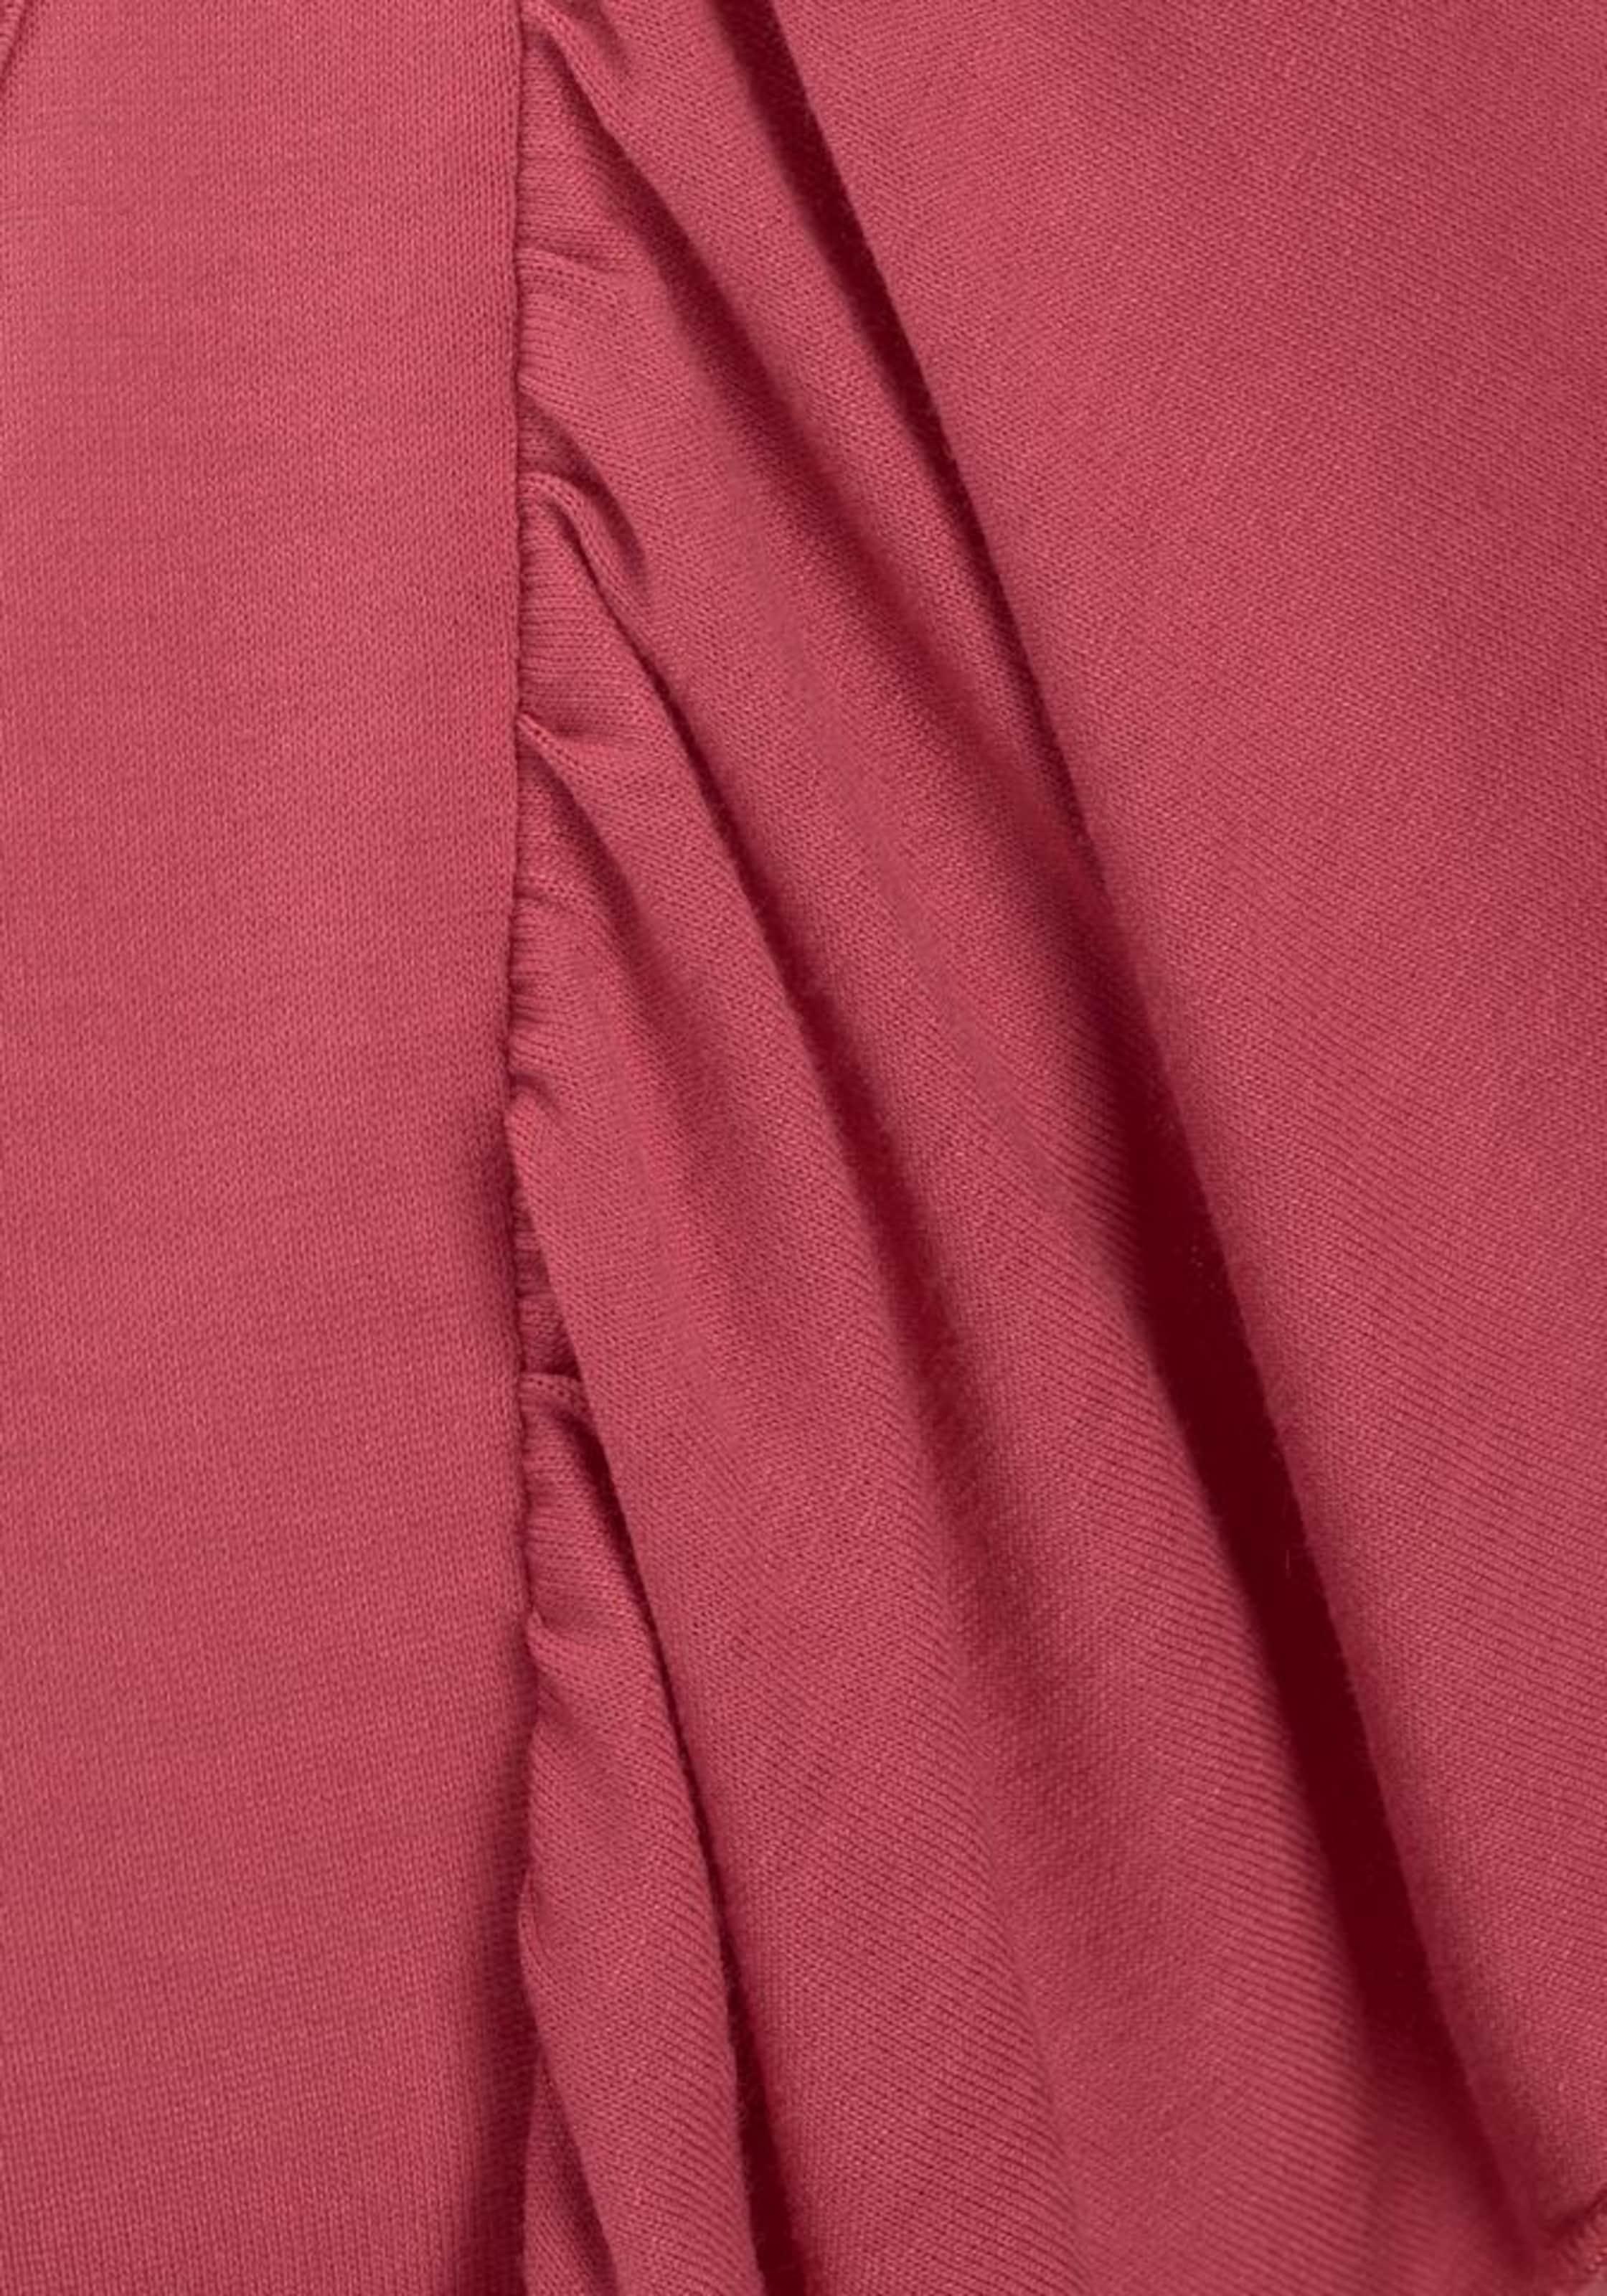 LASCANA Strandshirt Offizielle Seite yblQ6XjRg